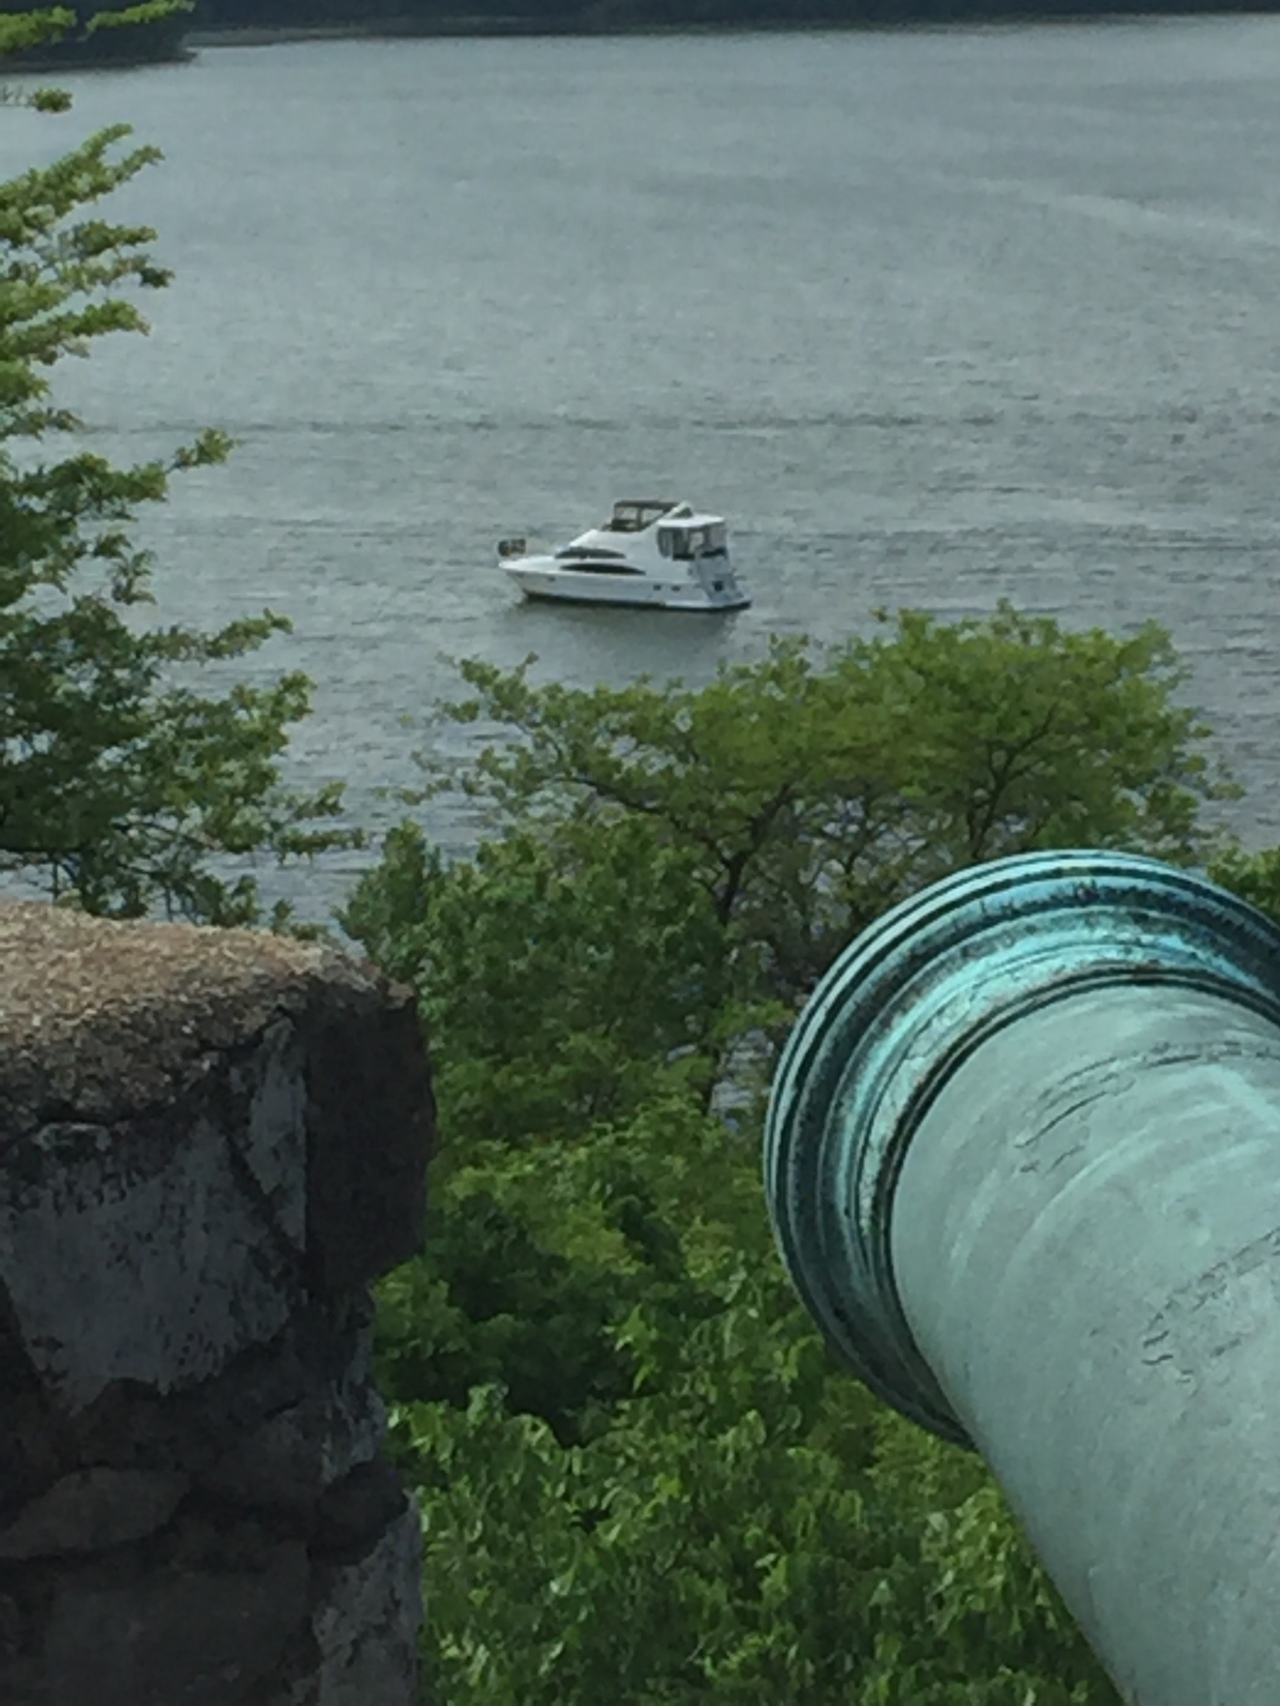 Fort Ticonderoga and BurlingtonVT